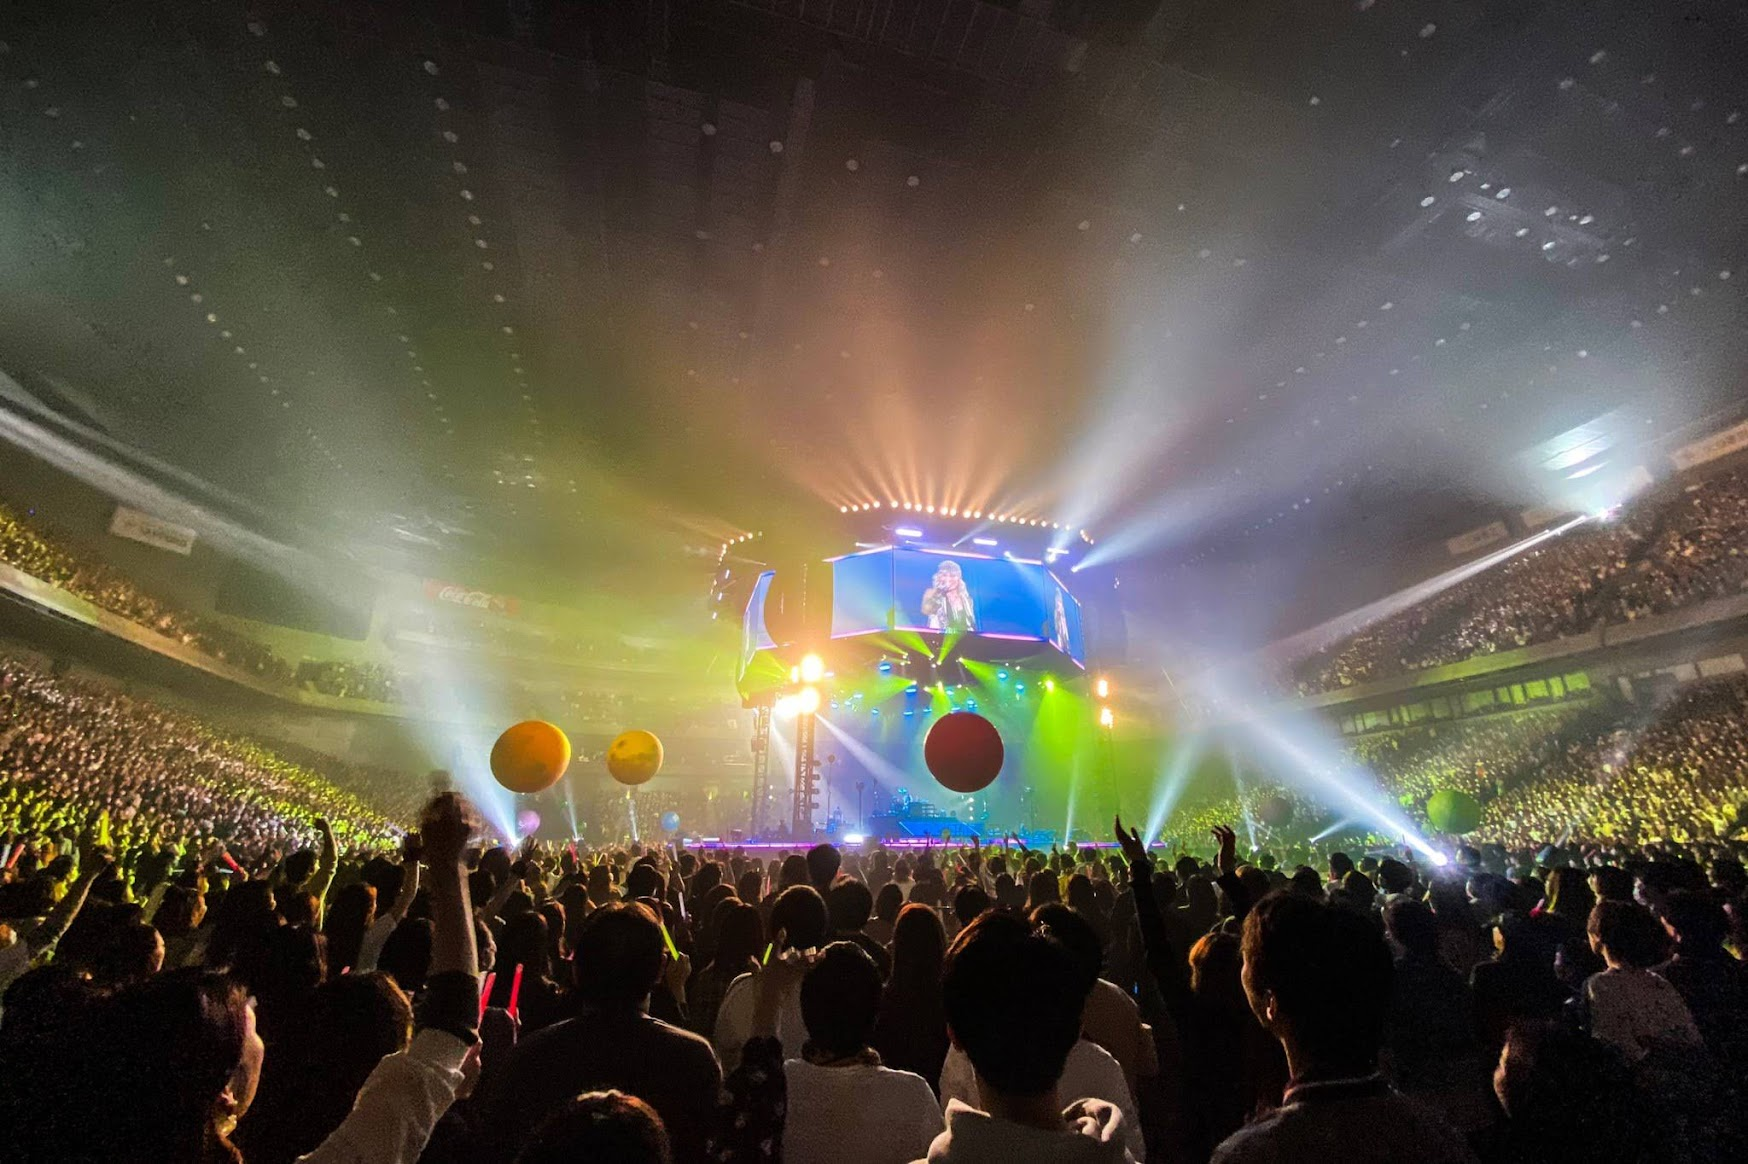 L'Arc-en-Ciel 彩虹樂團 另類「空氣演唱會」超嗨 hyde「一起慶功吧!」